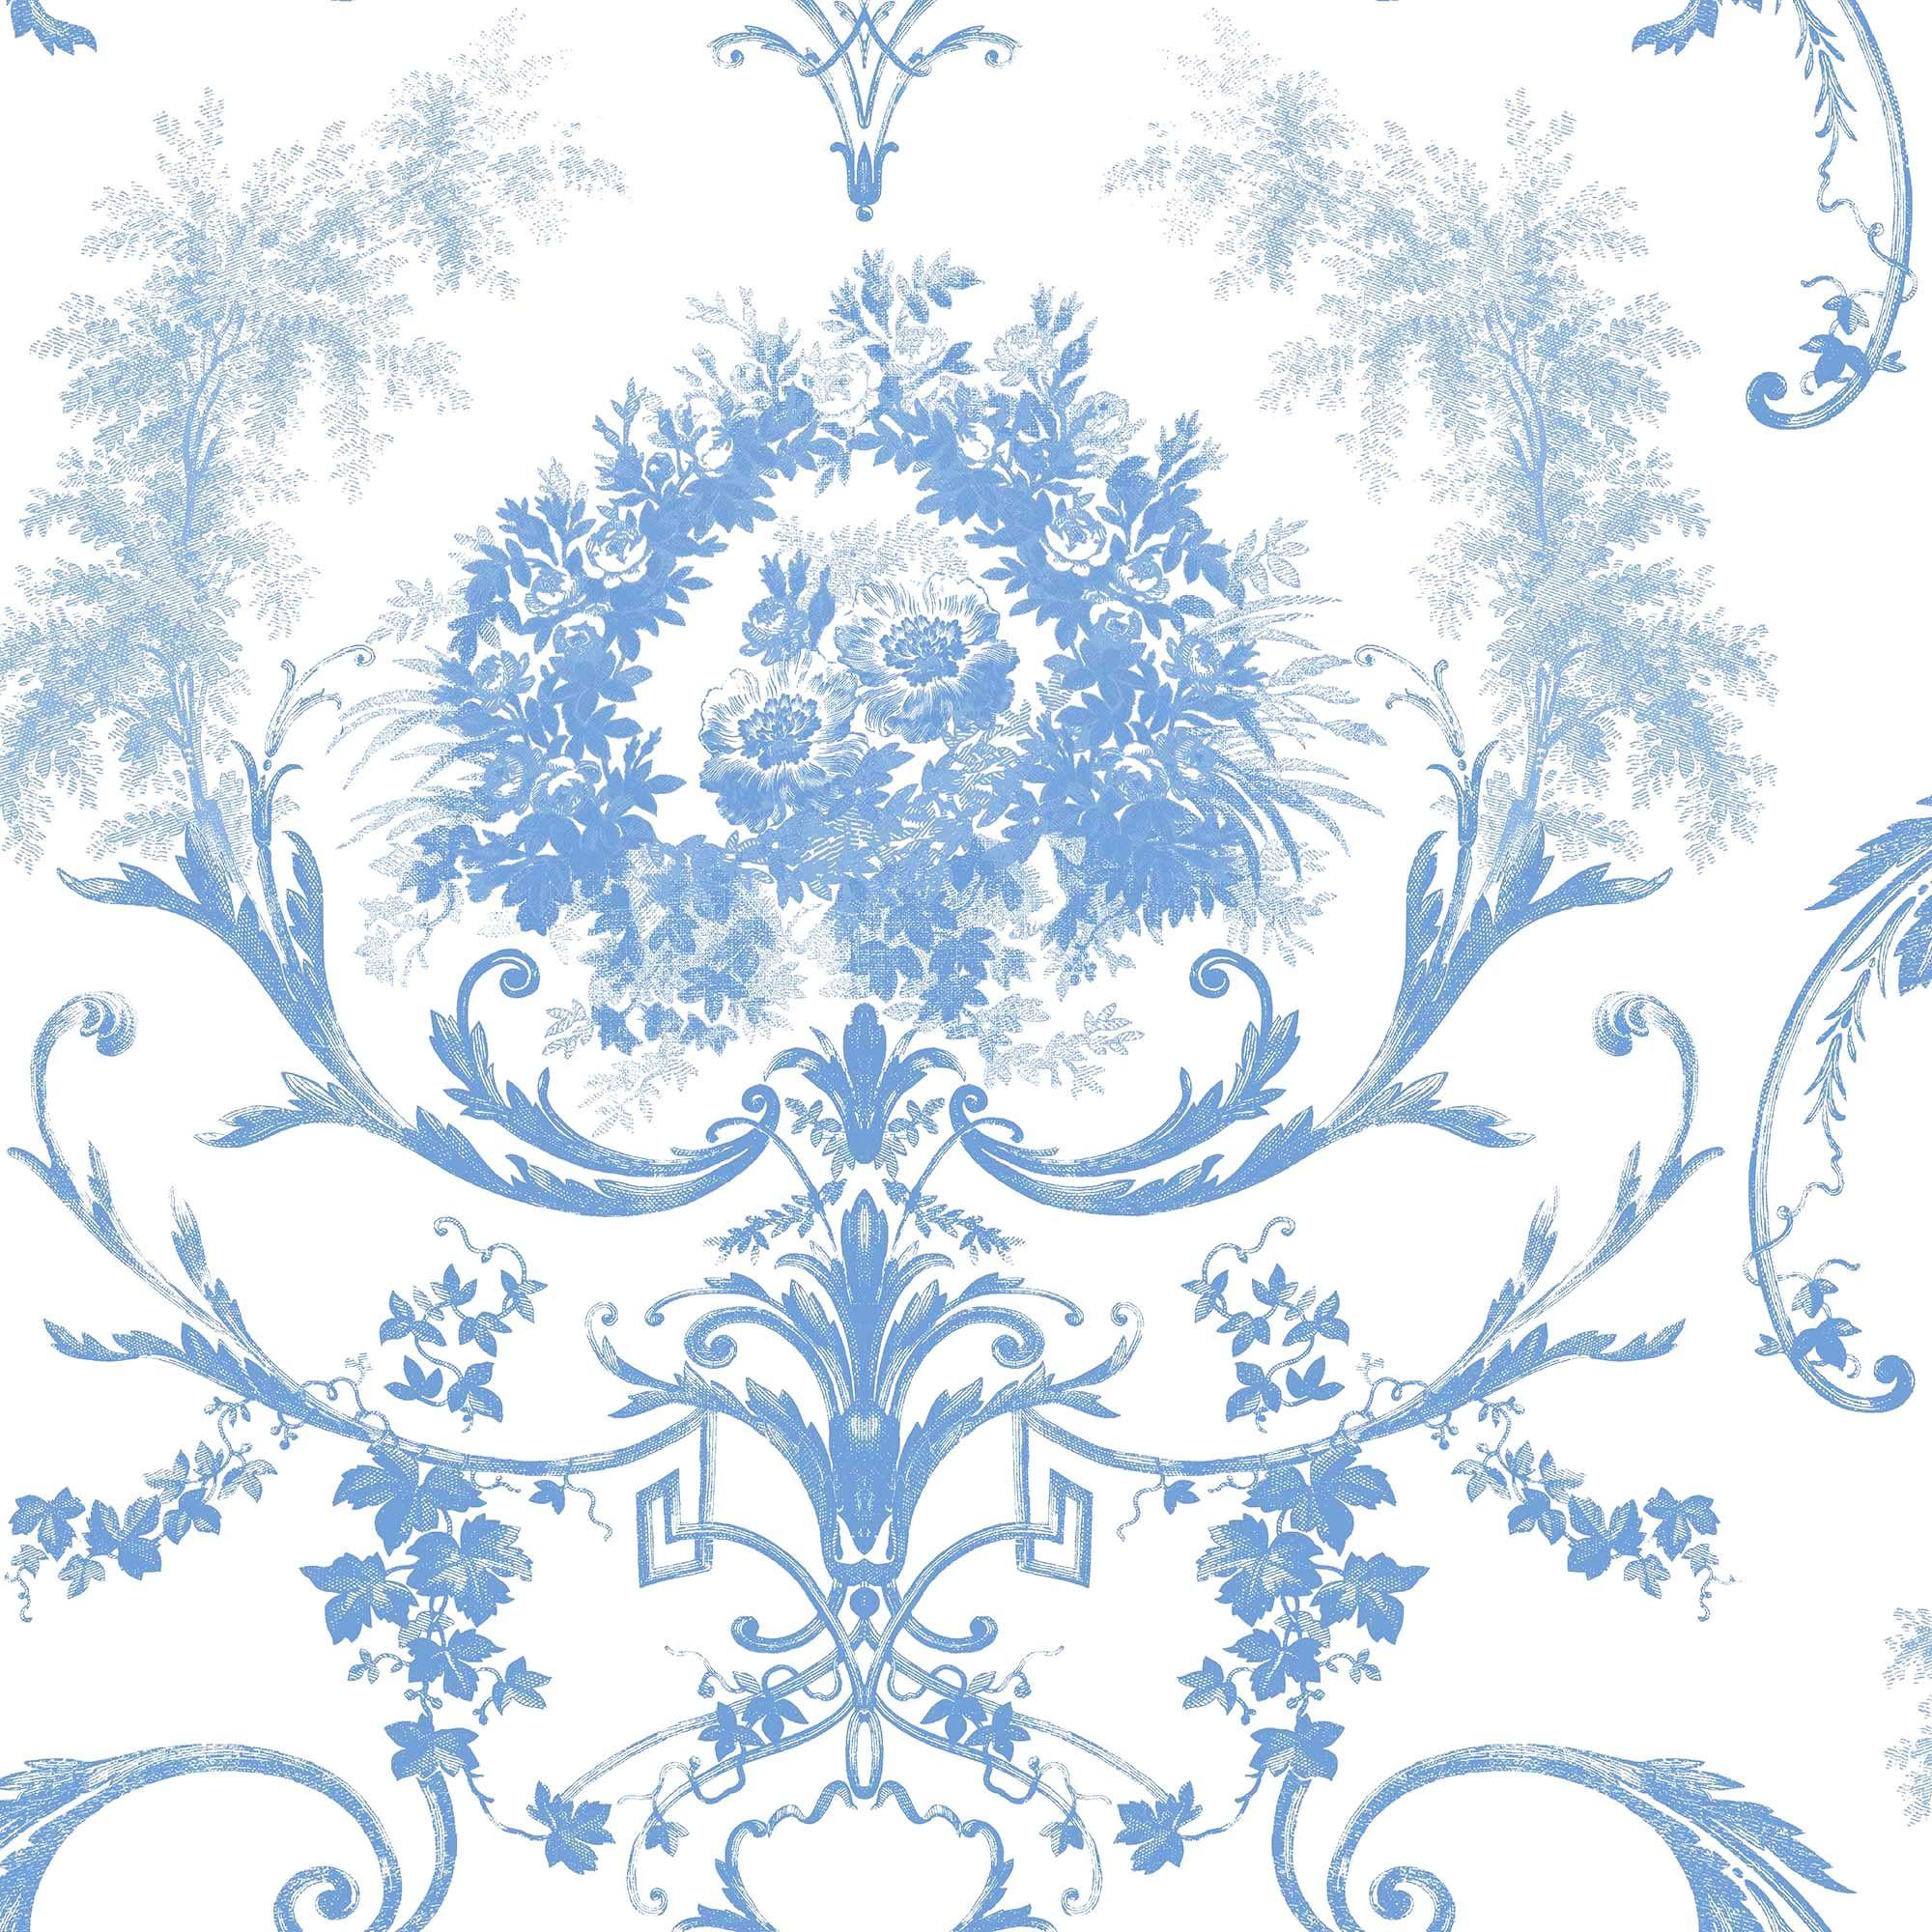 Dorma Blue Toile Wallpaper Toile wallpaper, Damask